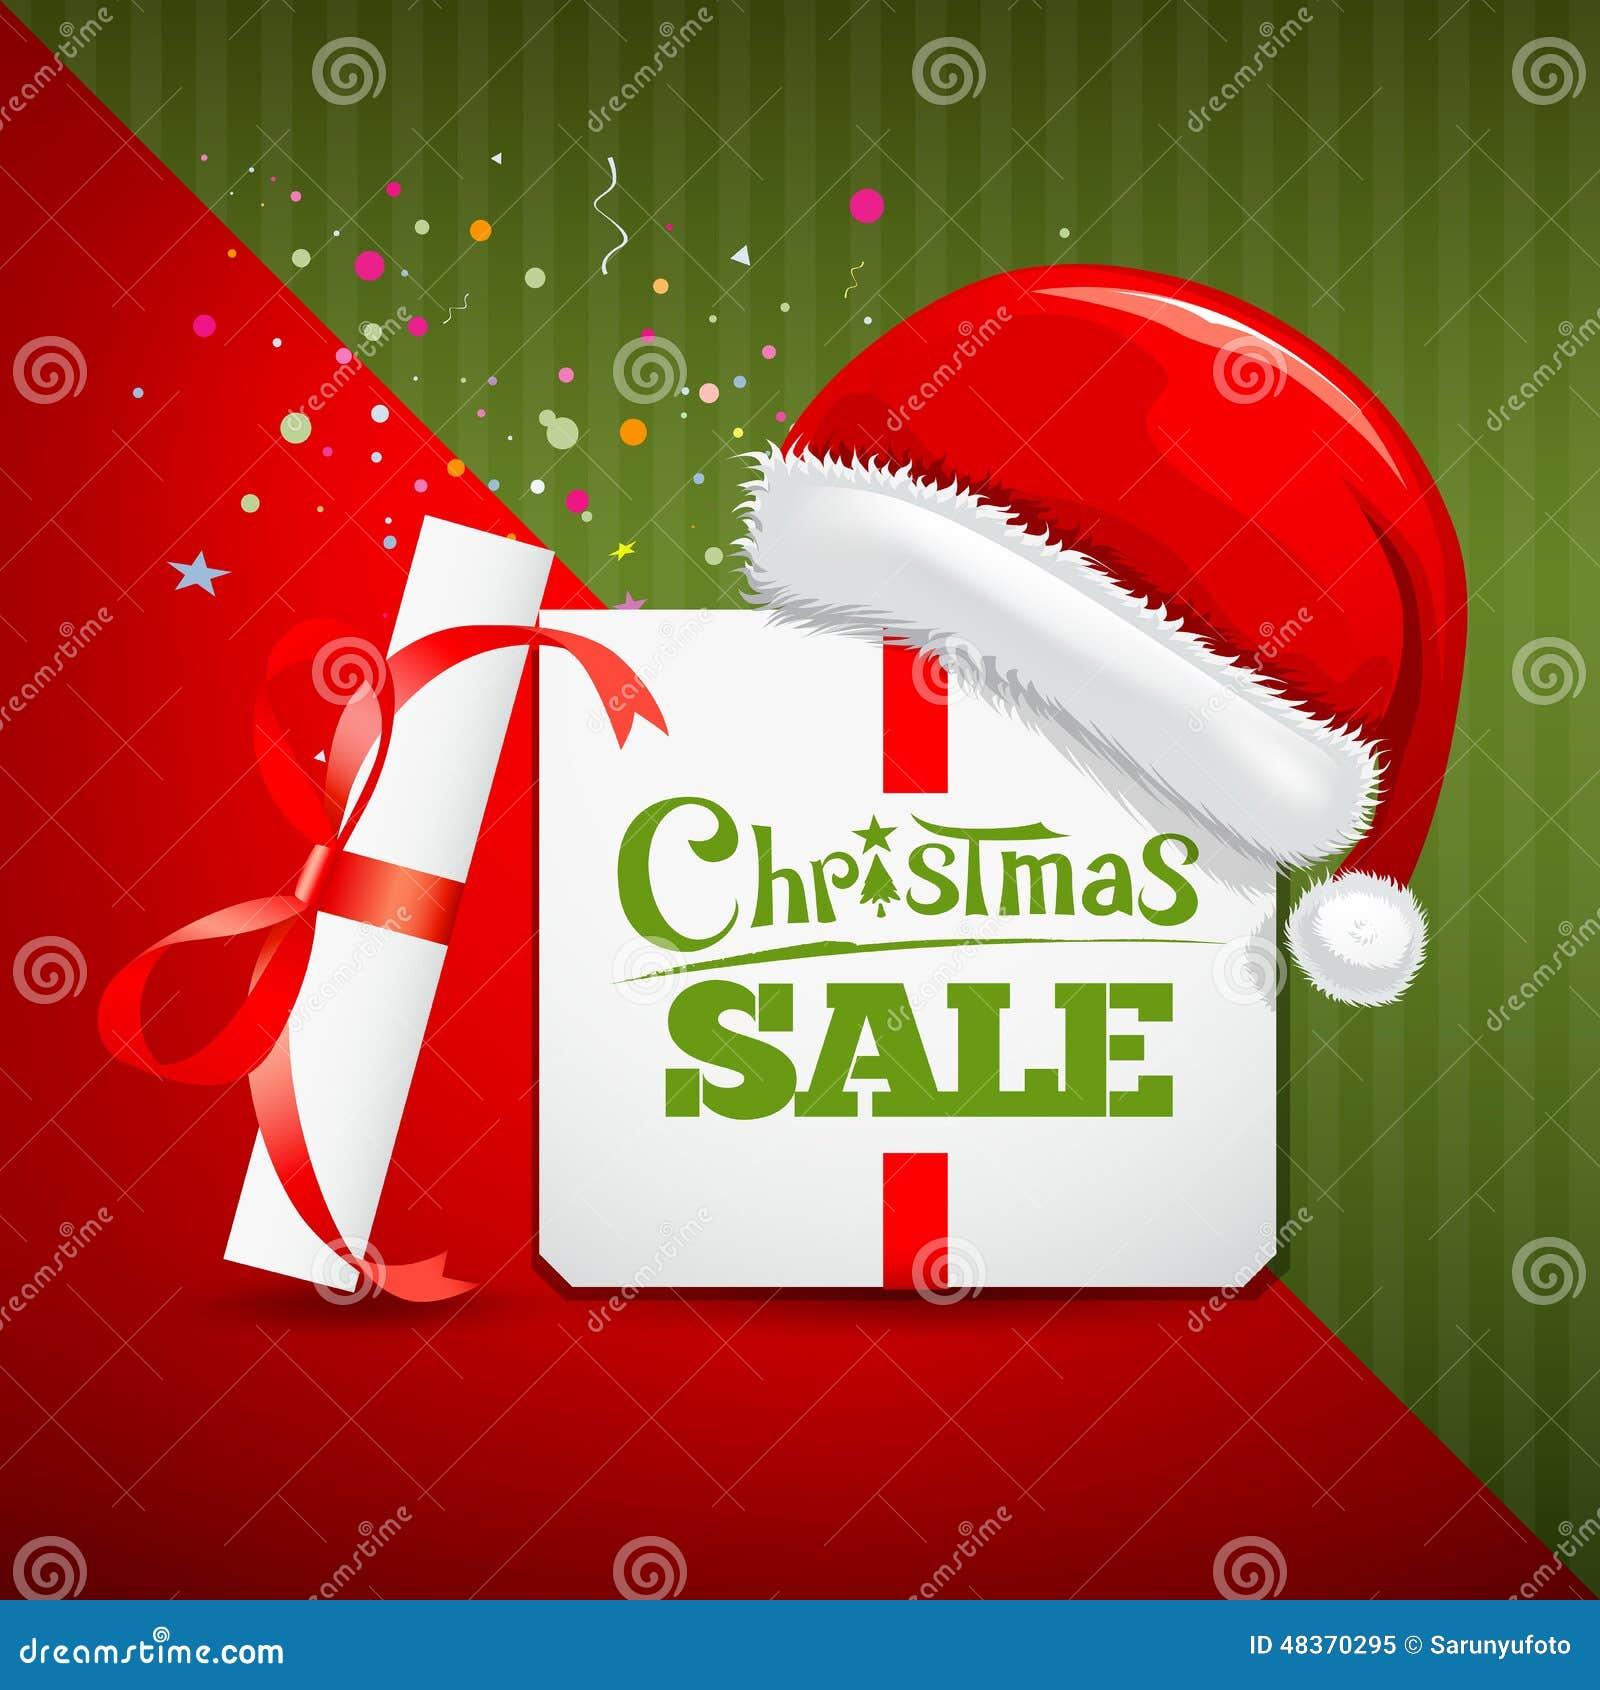 Merry Christmas Gift Box Santa Hat Sale Design Stock Illustration ...